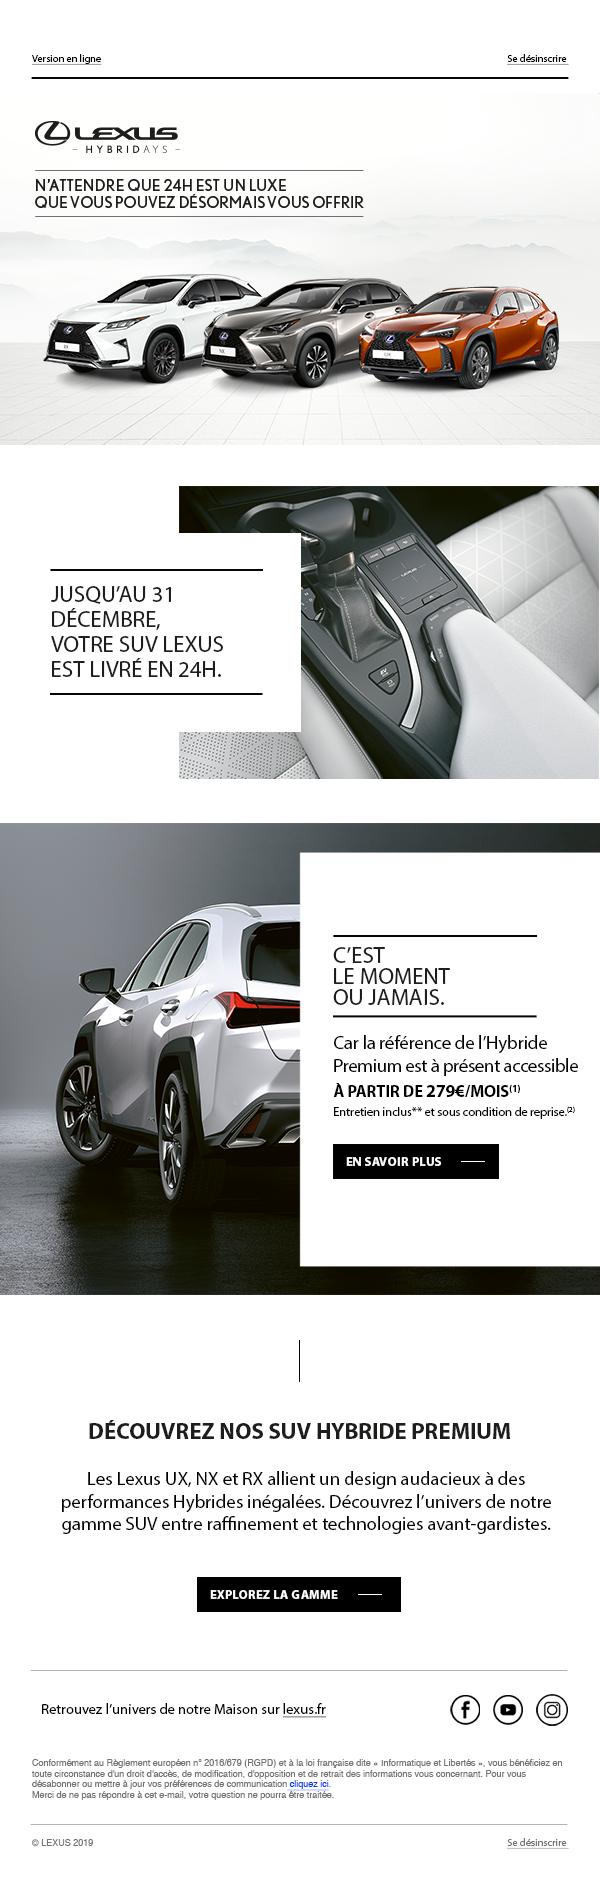 Emailing_Lexus_hybridays_V4 copie